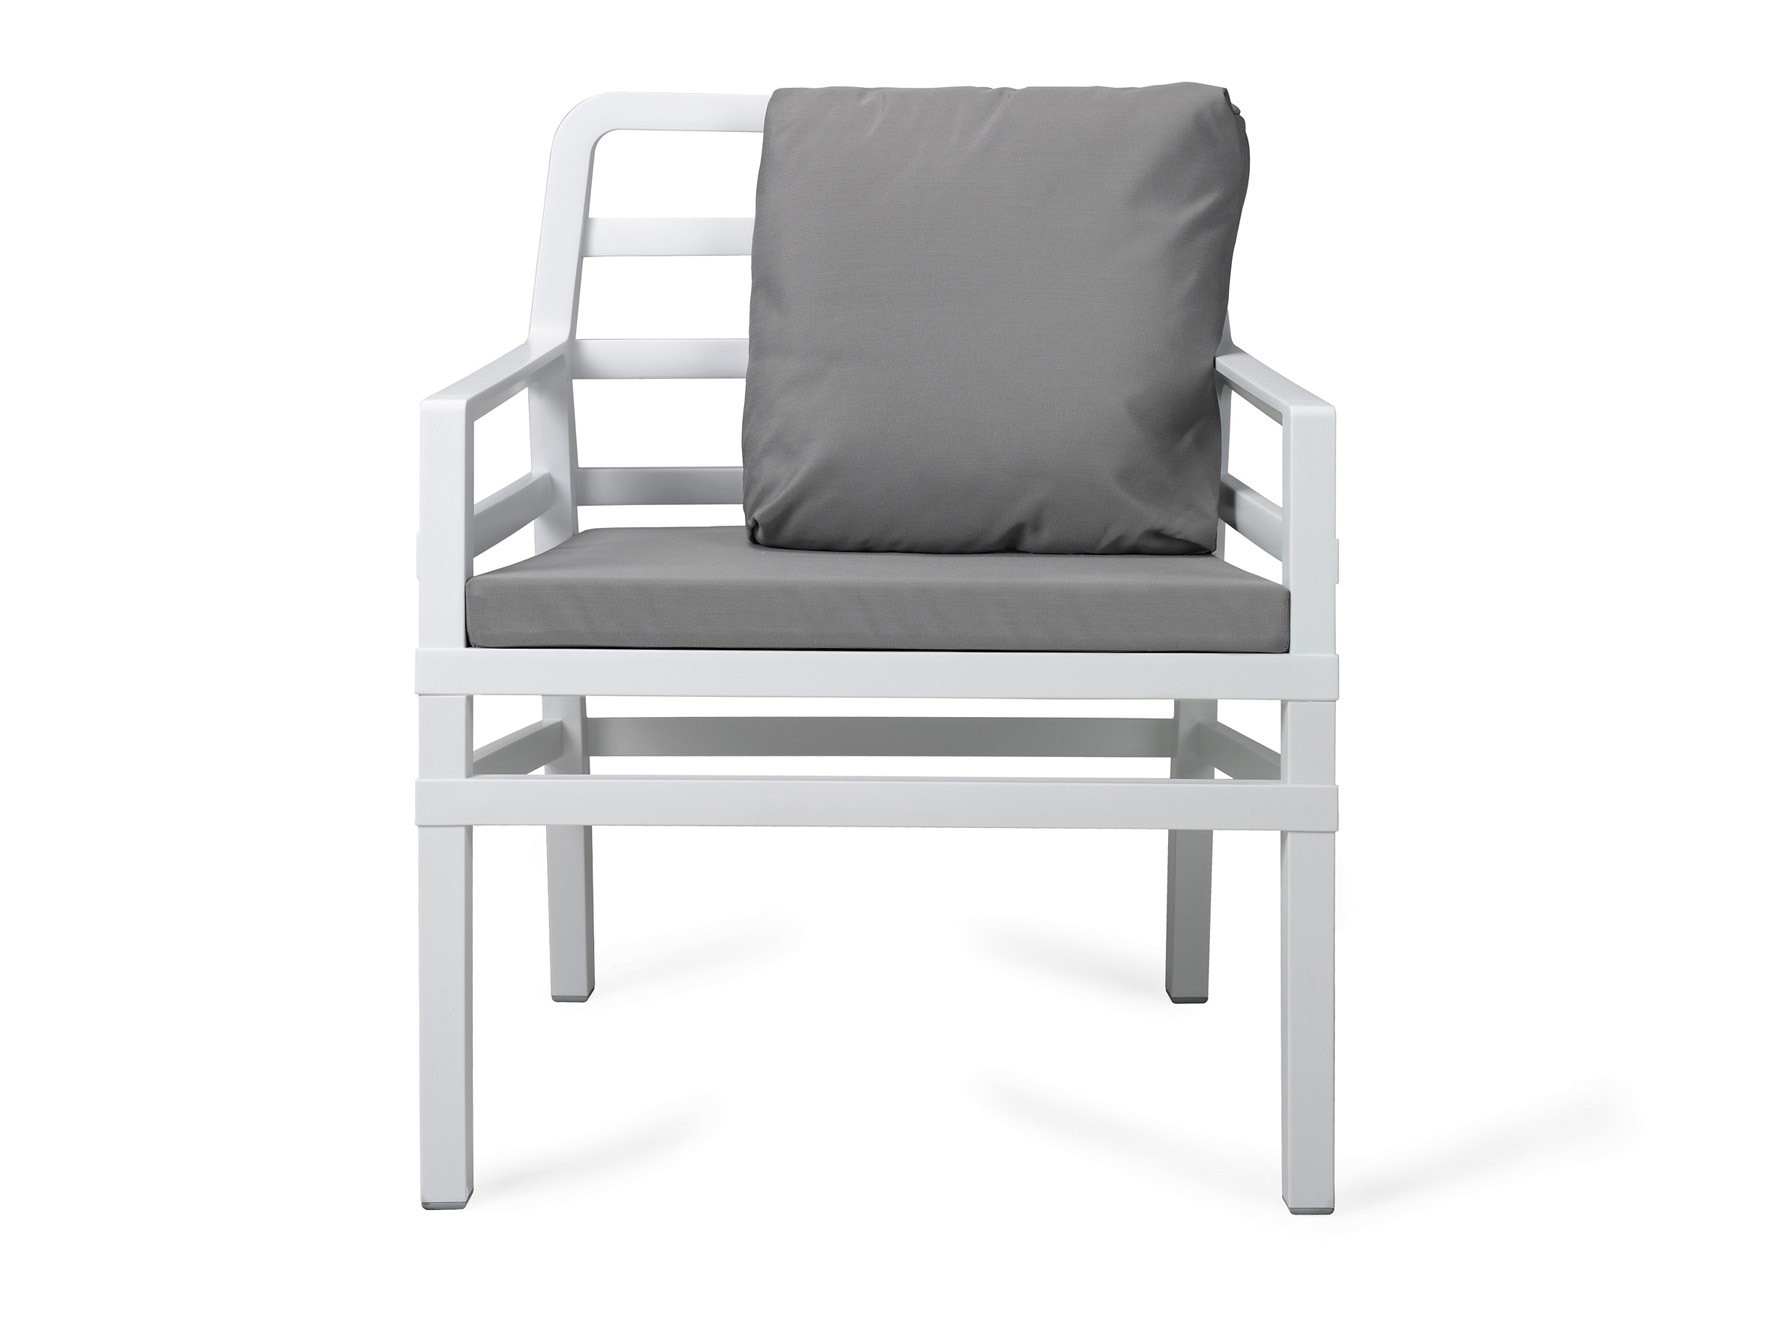 Nardi Gartensessel / Lounge Sessel Aria Kunststoff bianco / grigio Bild 1